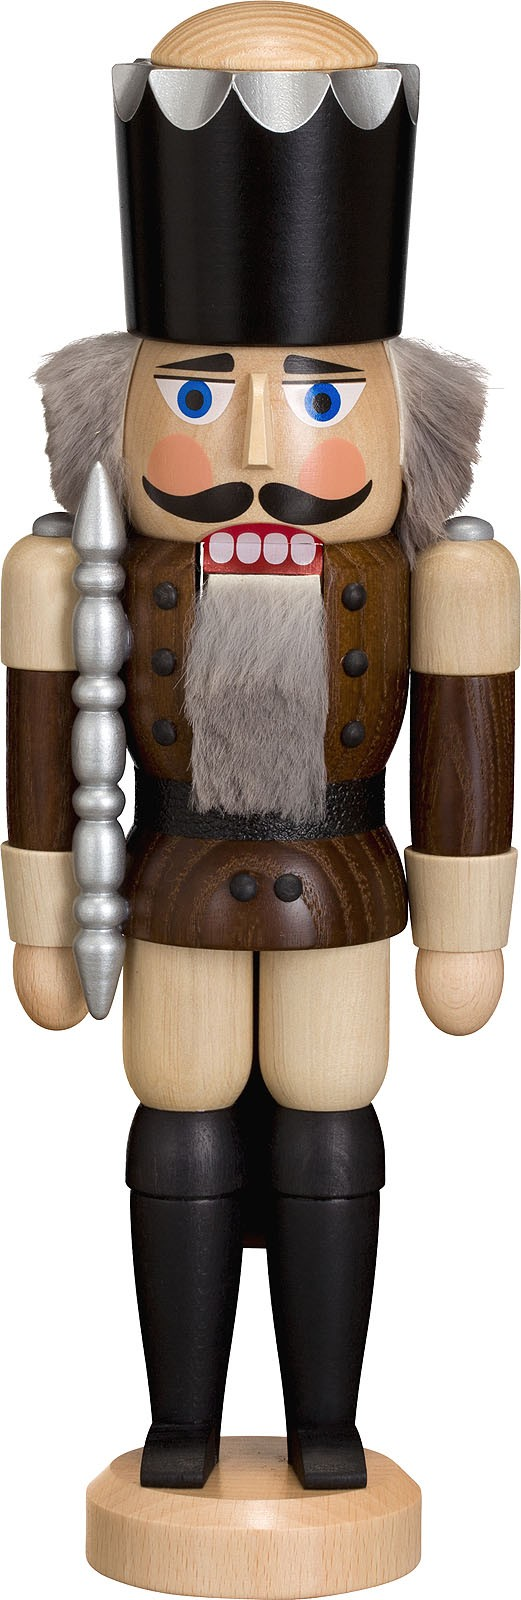 nutcracker king, ash tree glazed, brown, 11.42 inches